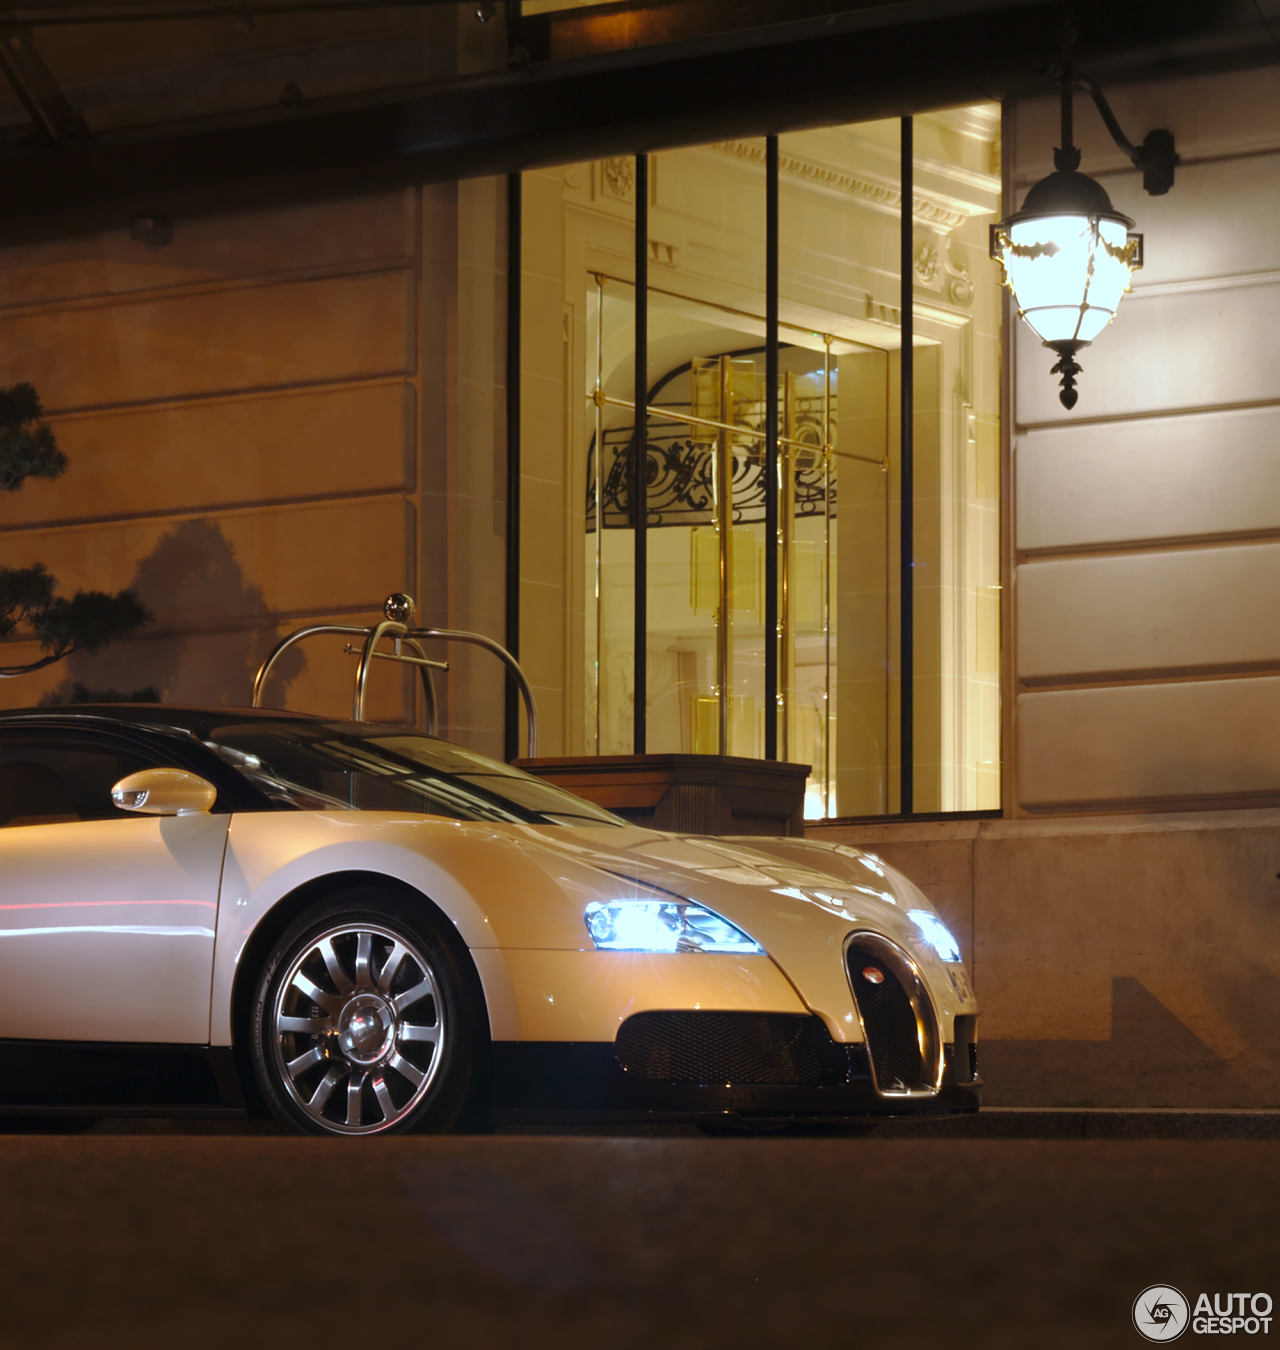 Bugatti Veyron Spoiler: Bugatti Veyron 16.4